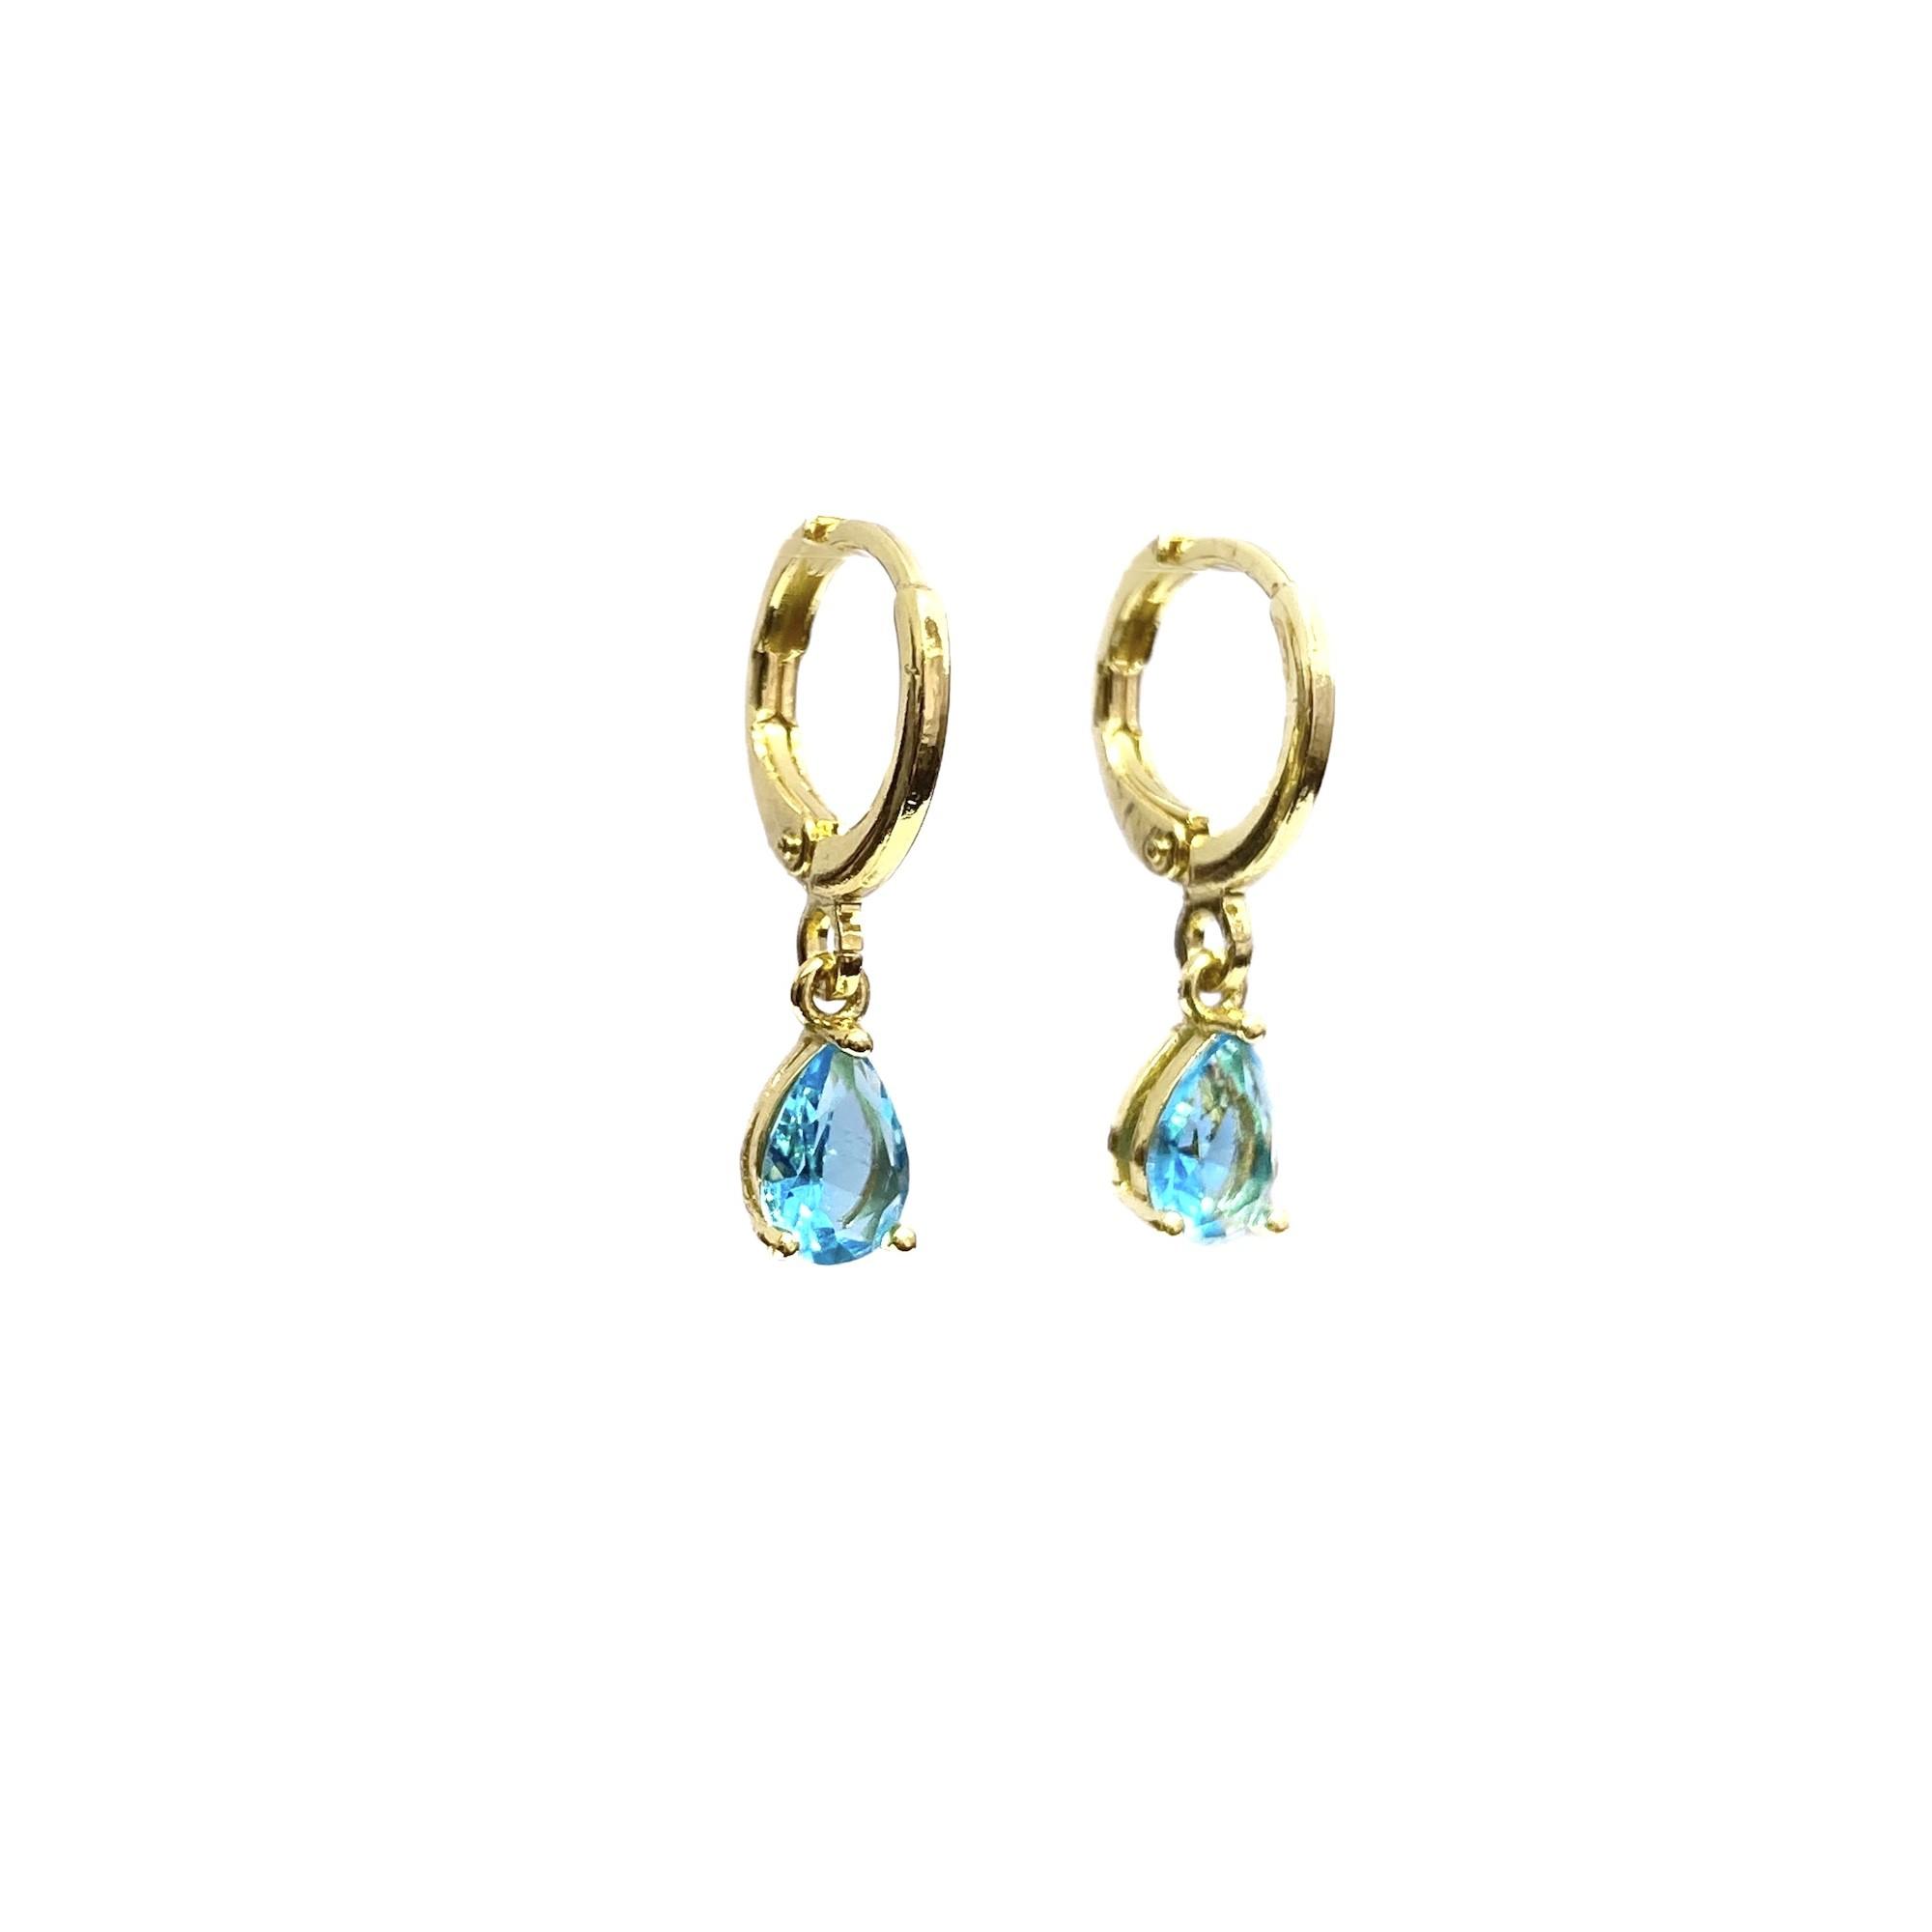 Brinco Argola Pedra Aquamarine (Banho Ouro 24k)